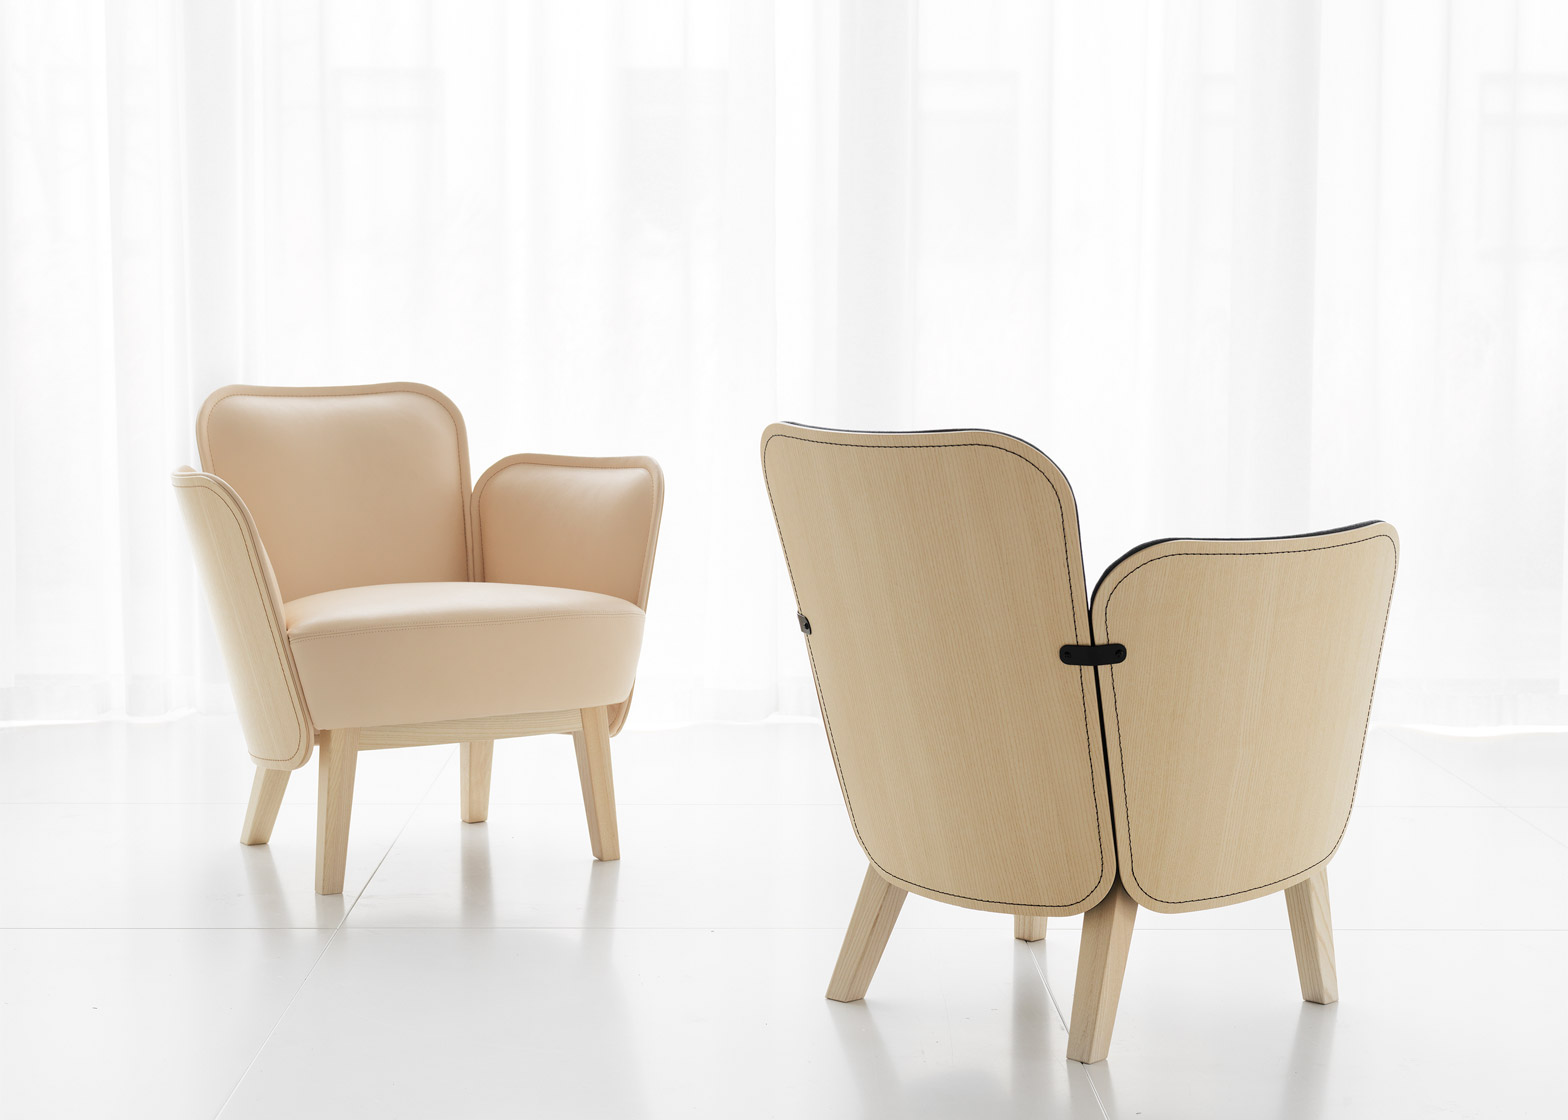 sofa-and-armchair-farg-blanche-Garsnas-stockholm-design-week-furniture-fair_dezeen_1568_1